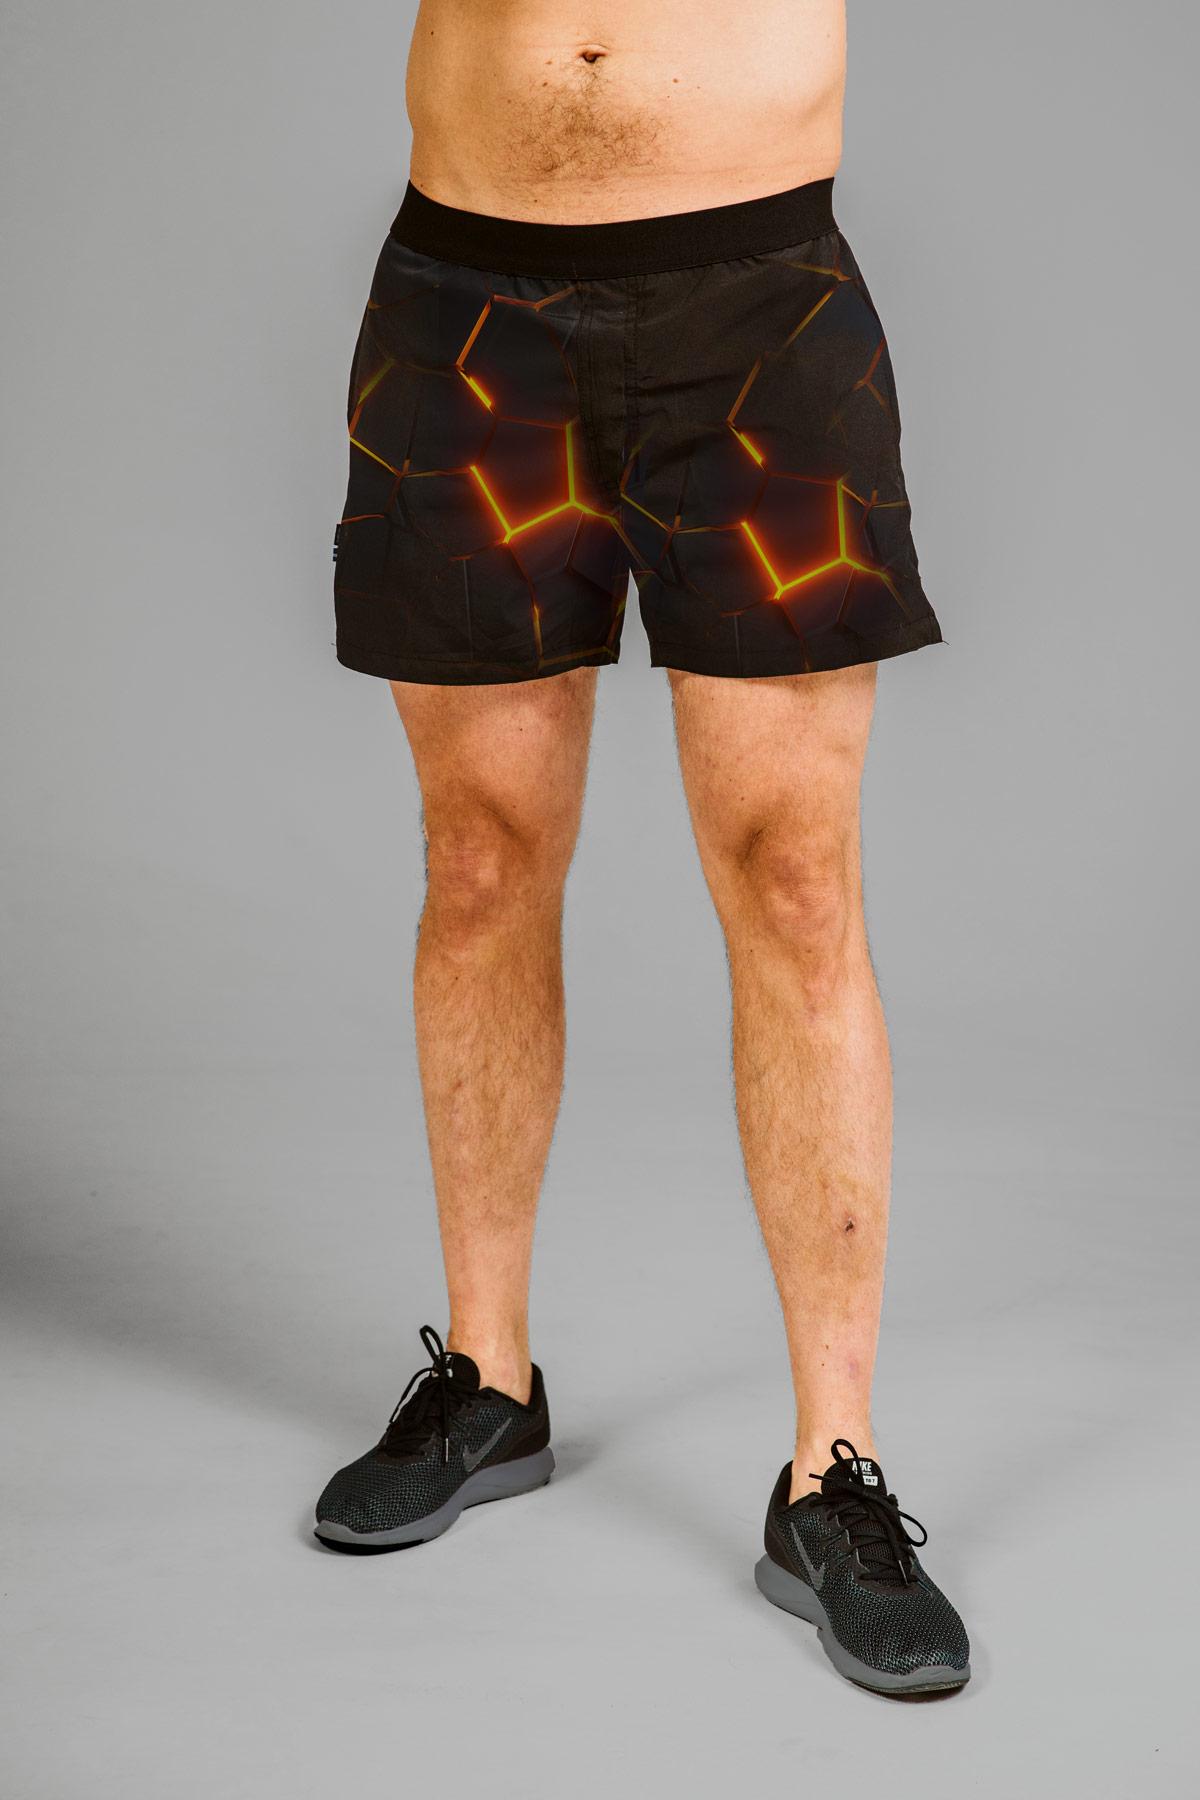 crossfit mönstrade coola herr shorts